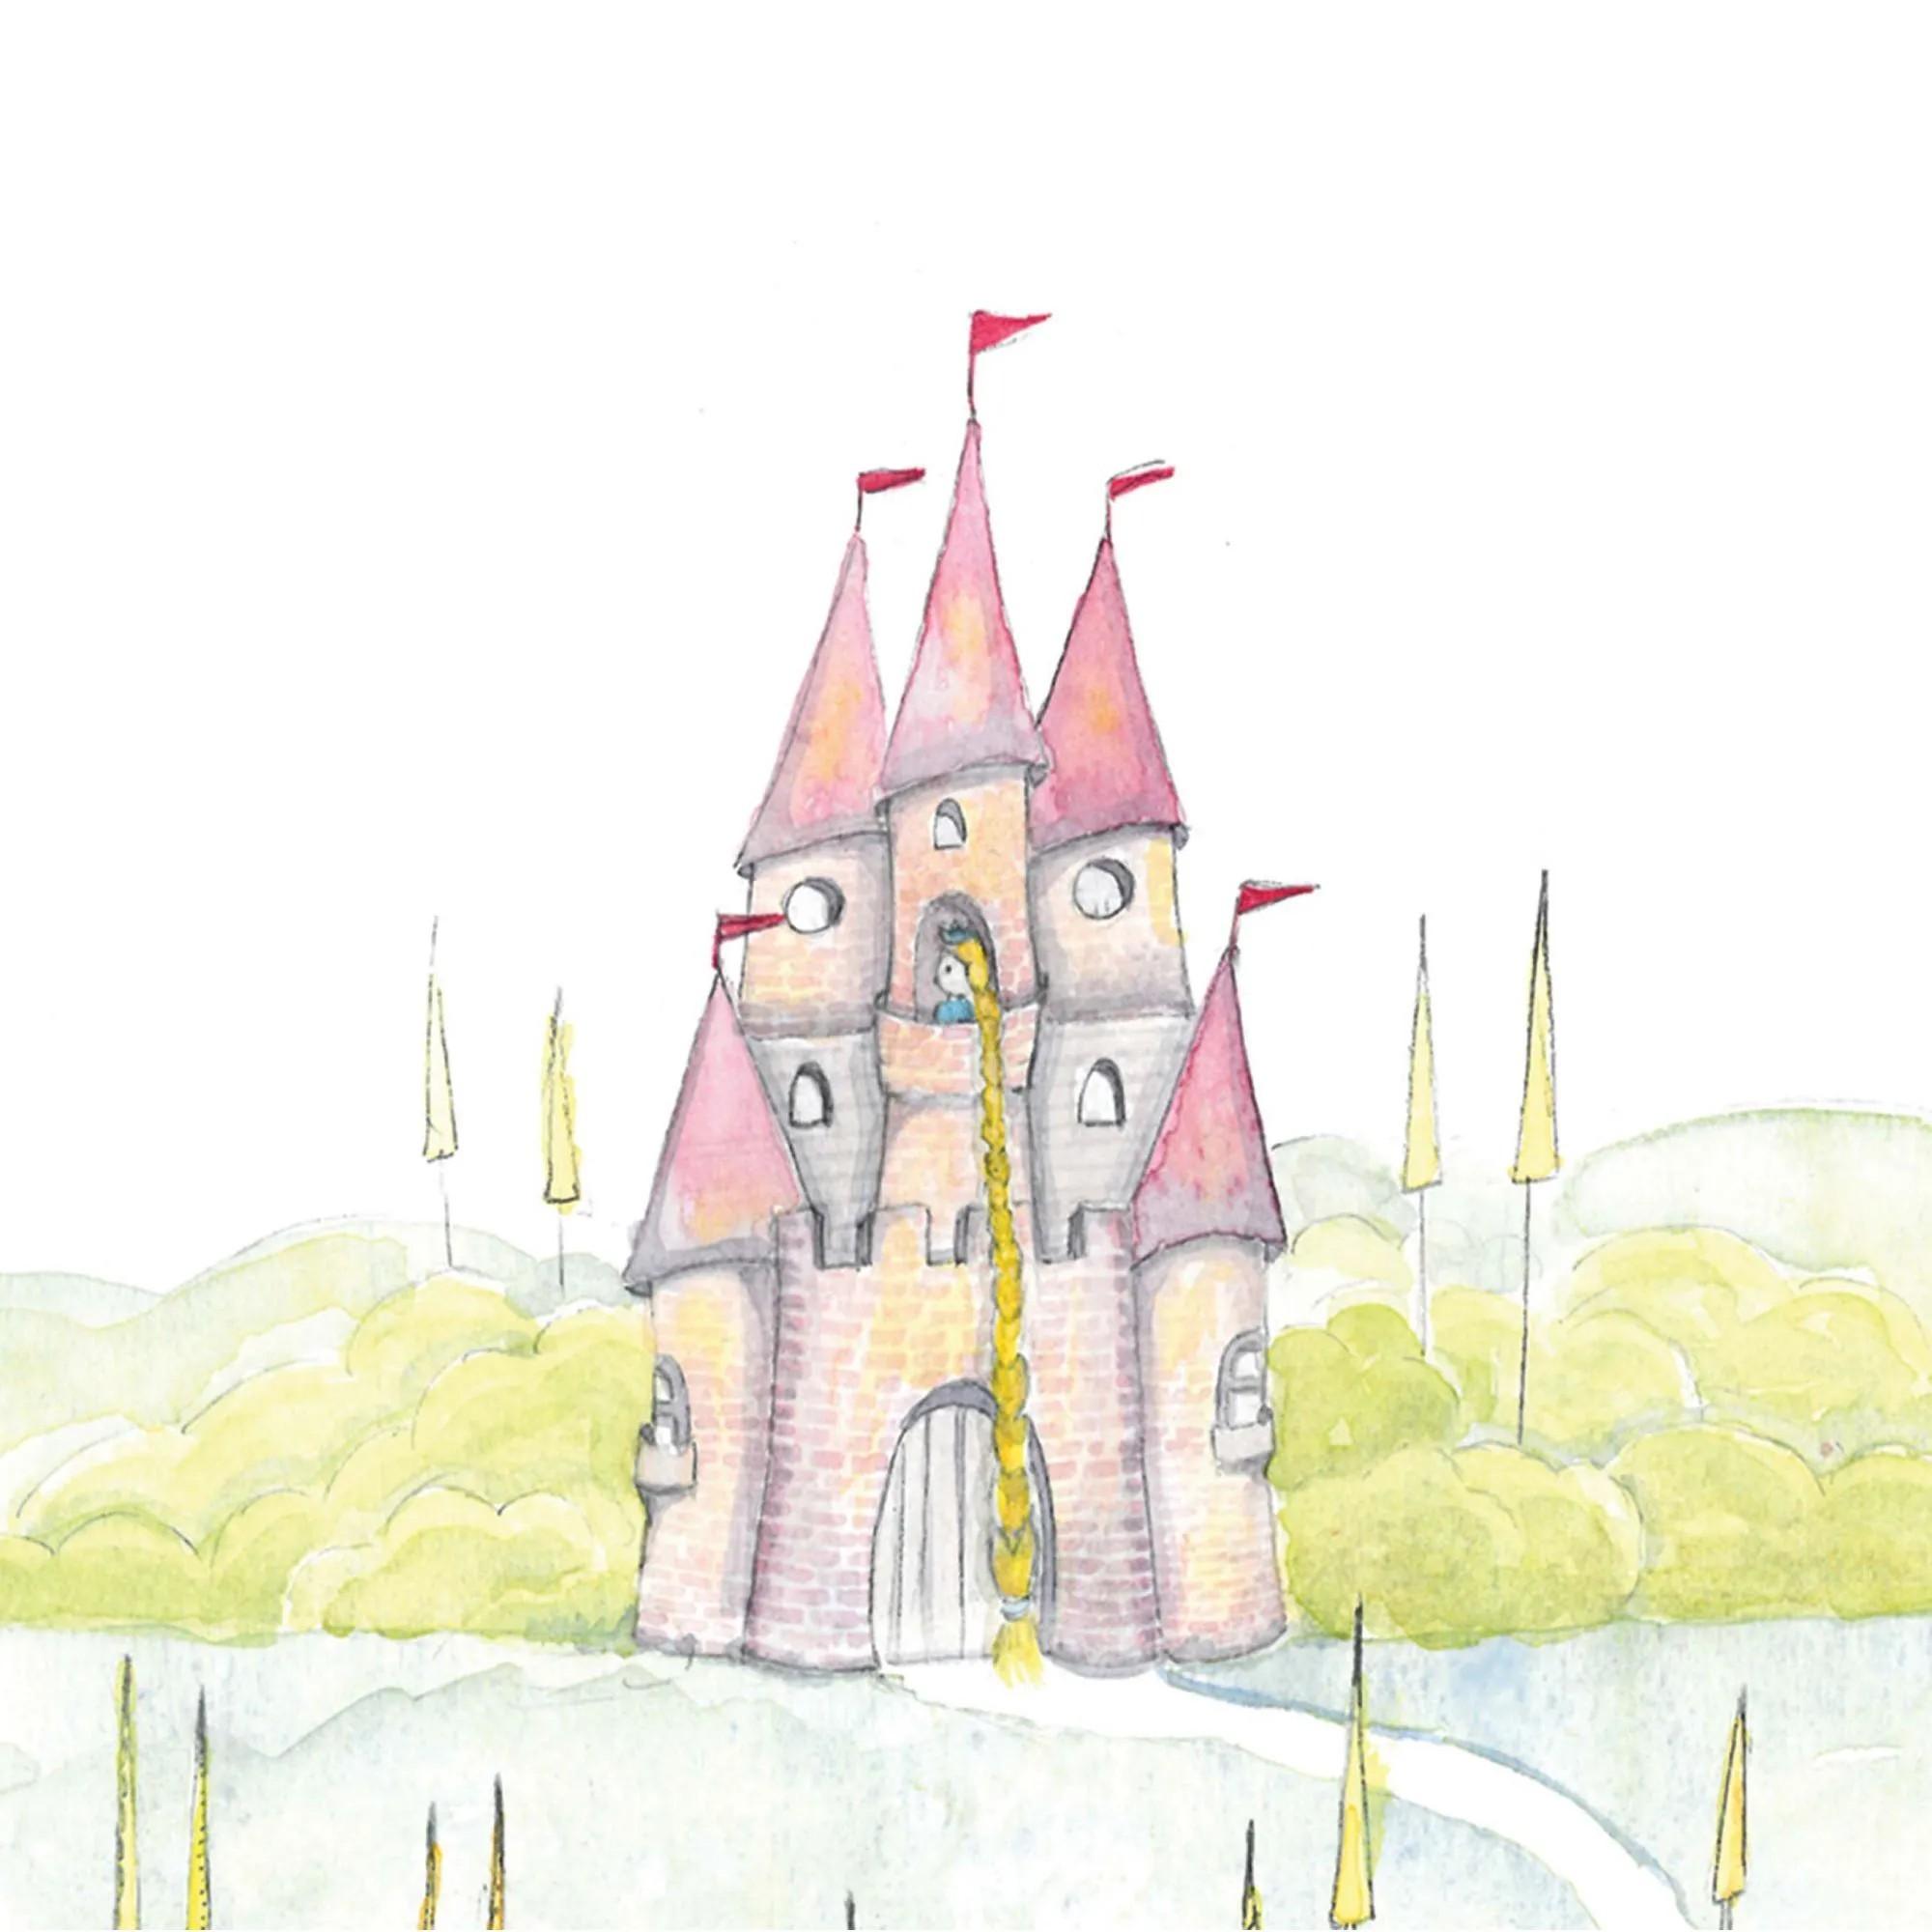 Capa para Edredom - Castelo